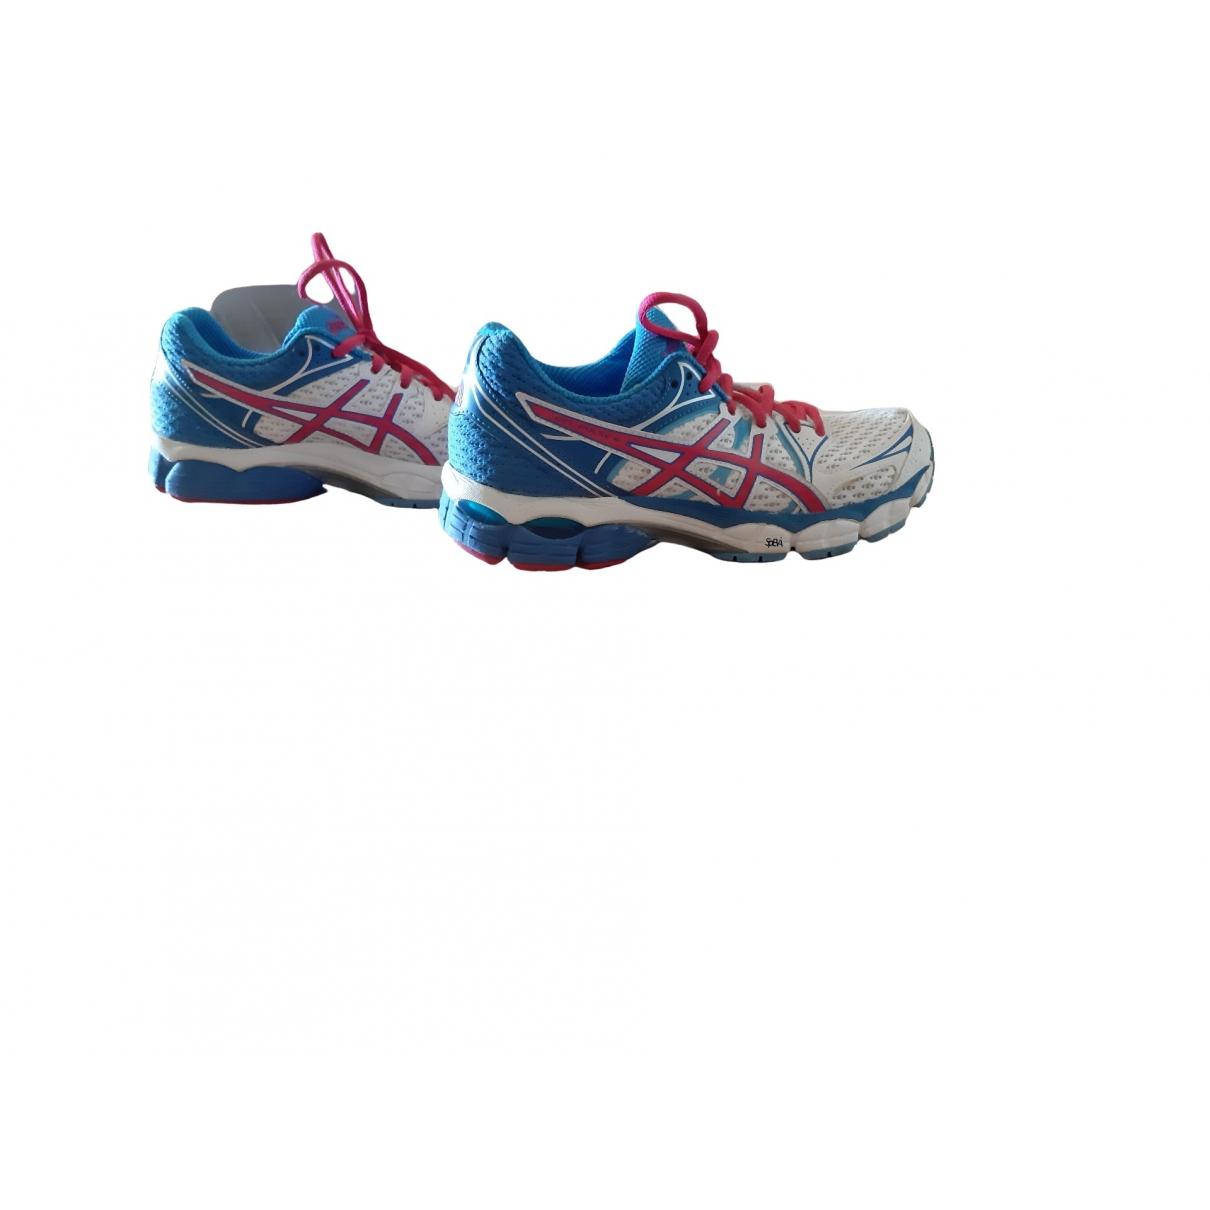 Asics \N Sneakers in  Weiss Leinen